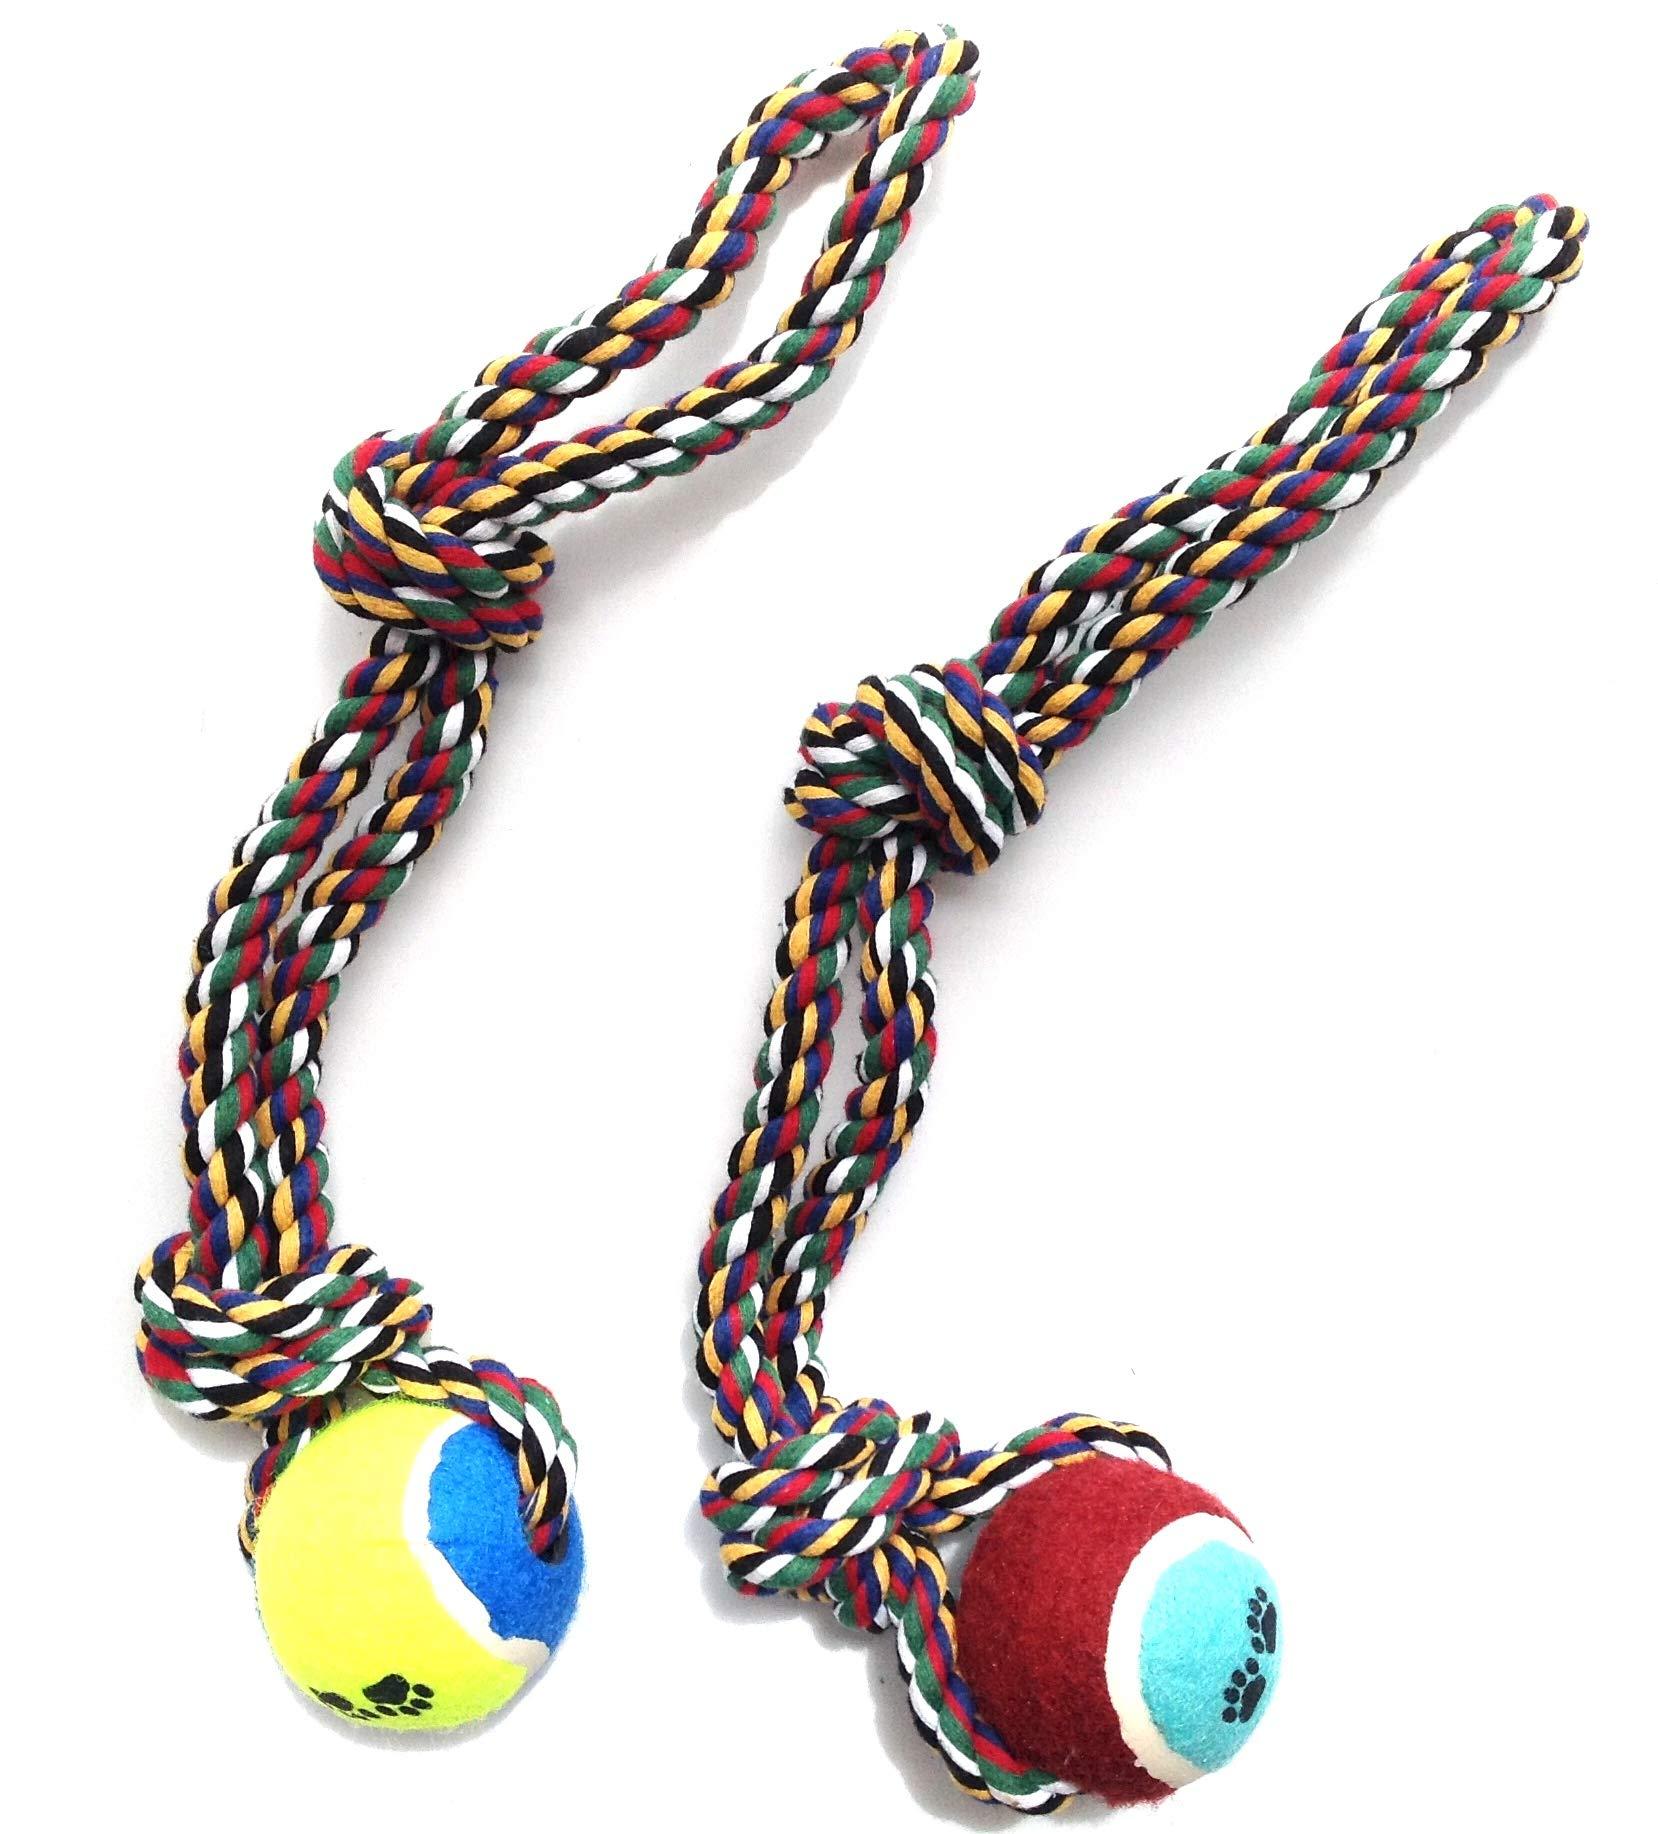 2 pcs juguete cuerda con pelota para perro mascota animales ...